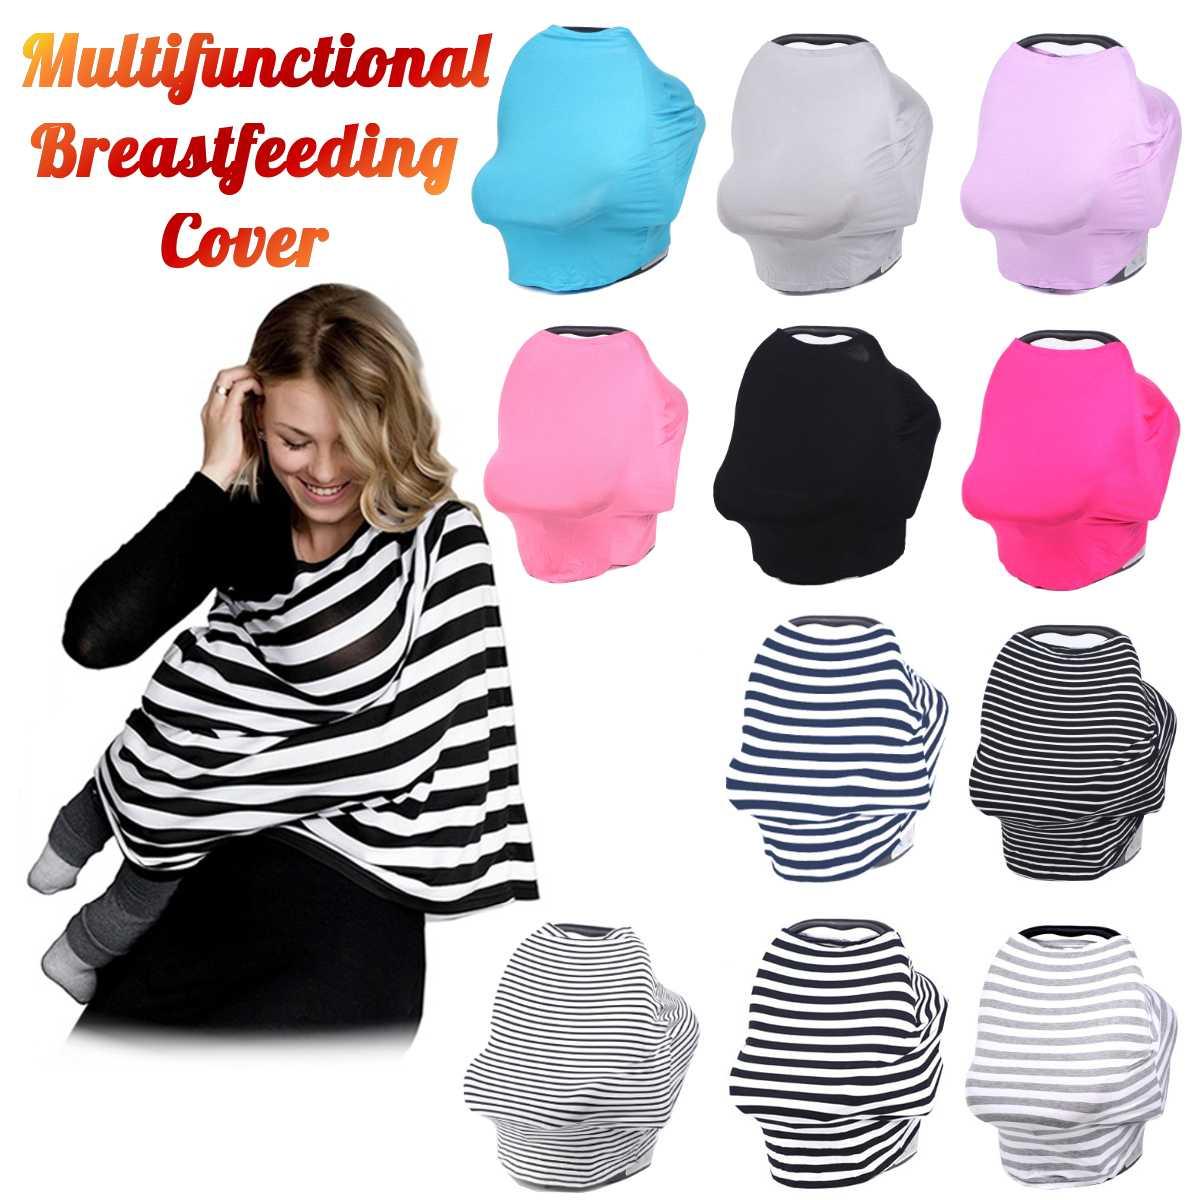 US 4 in1 Nursing Breastfeeding Scarf Cover Shawl Baby Kids Car Seat Canopy Tool